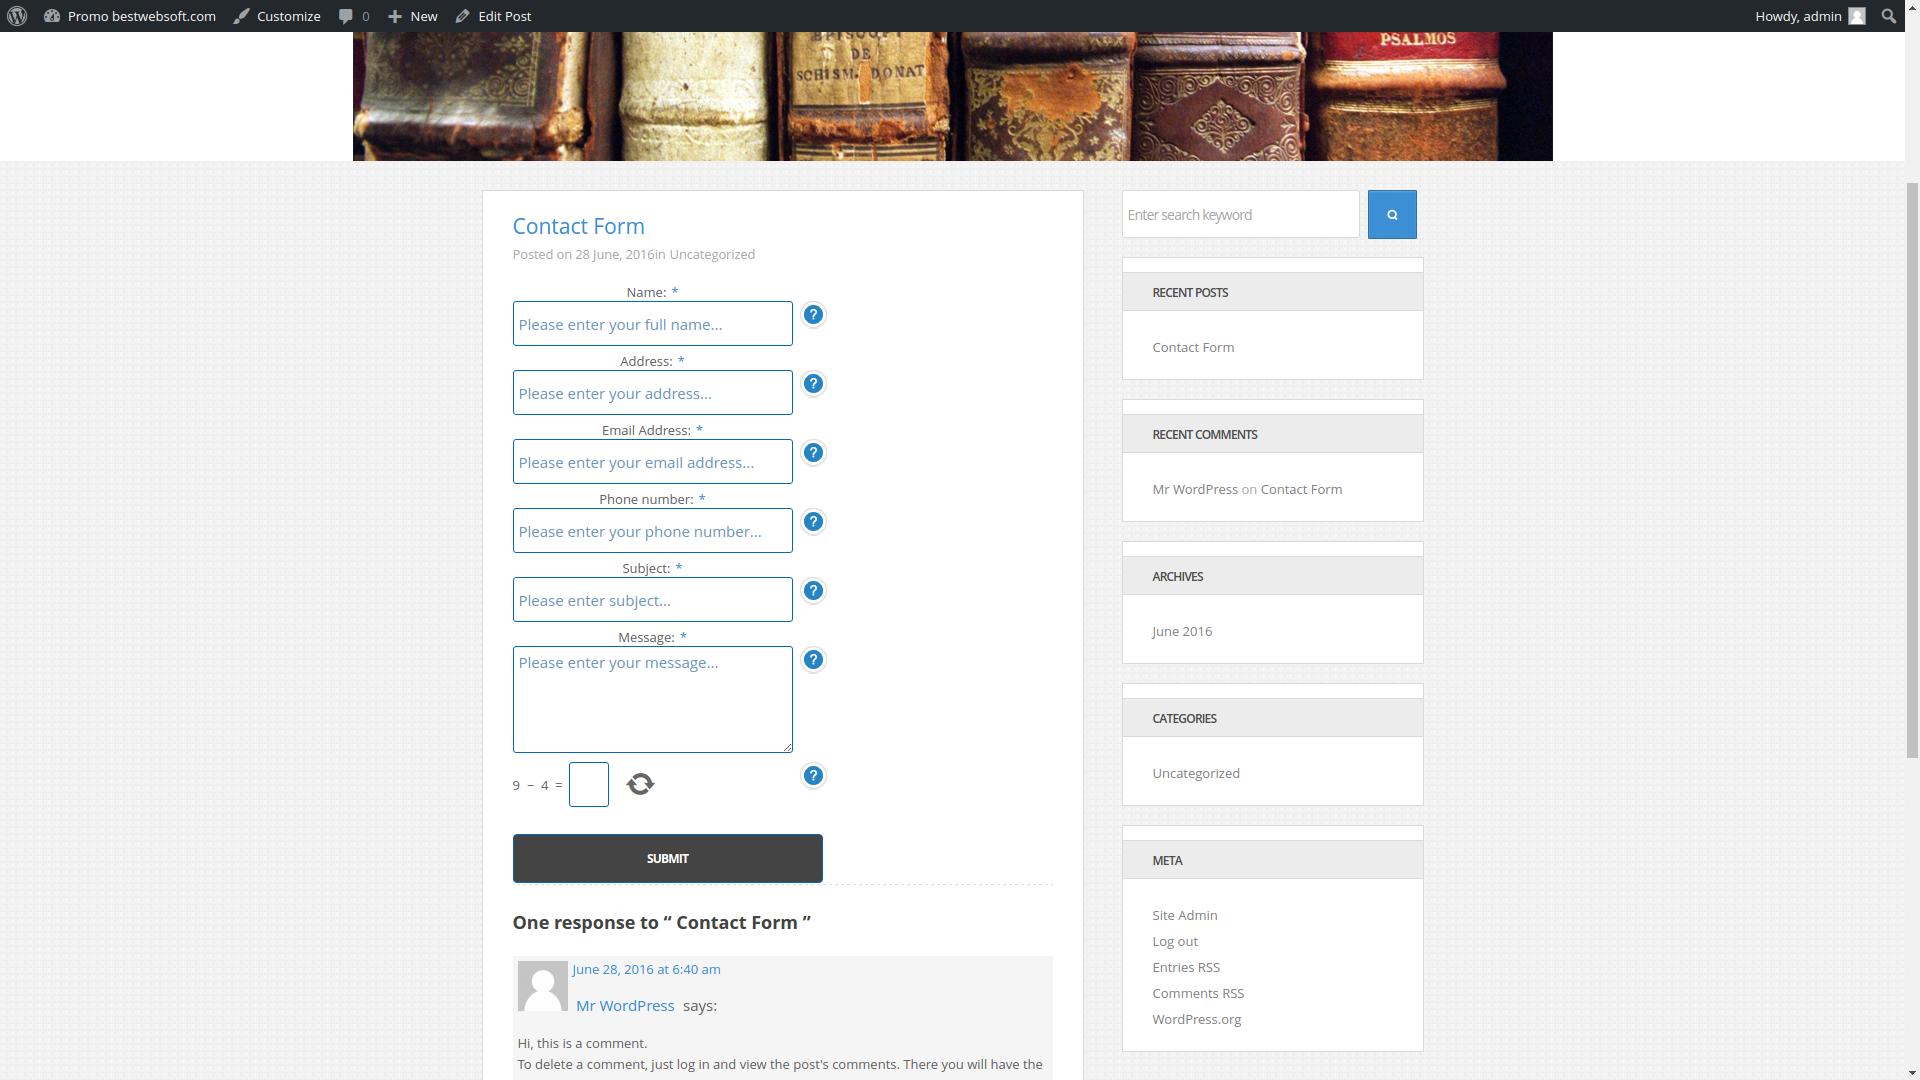 contact form screenshot 9